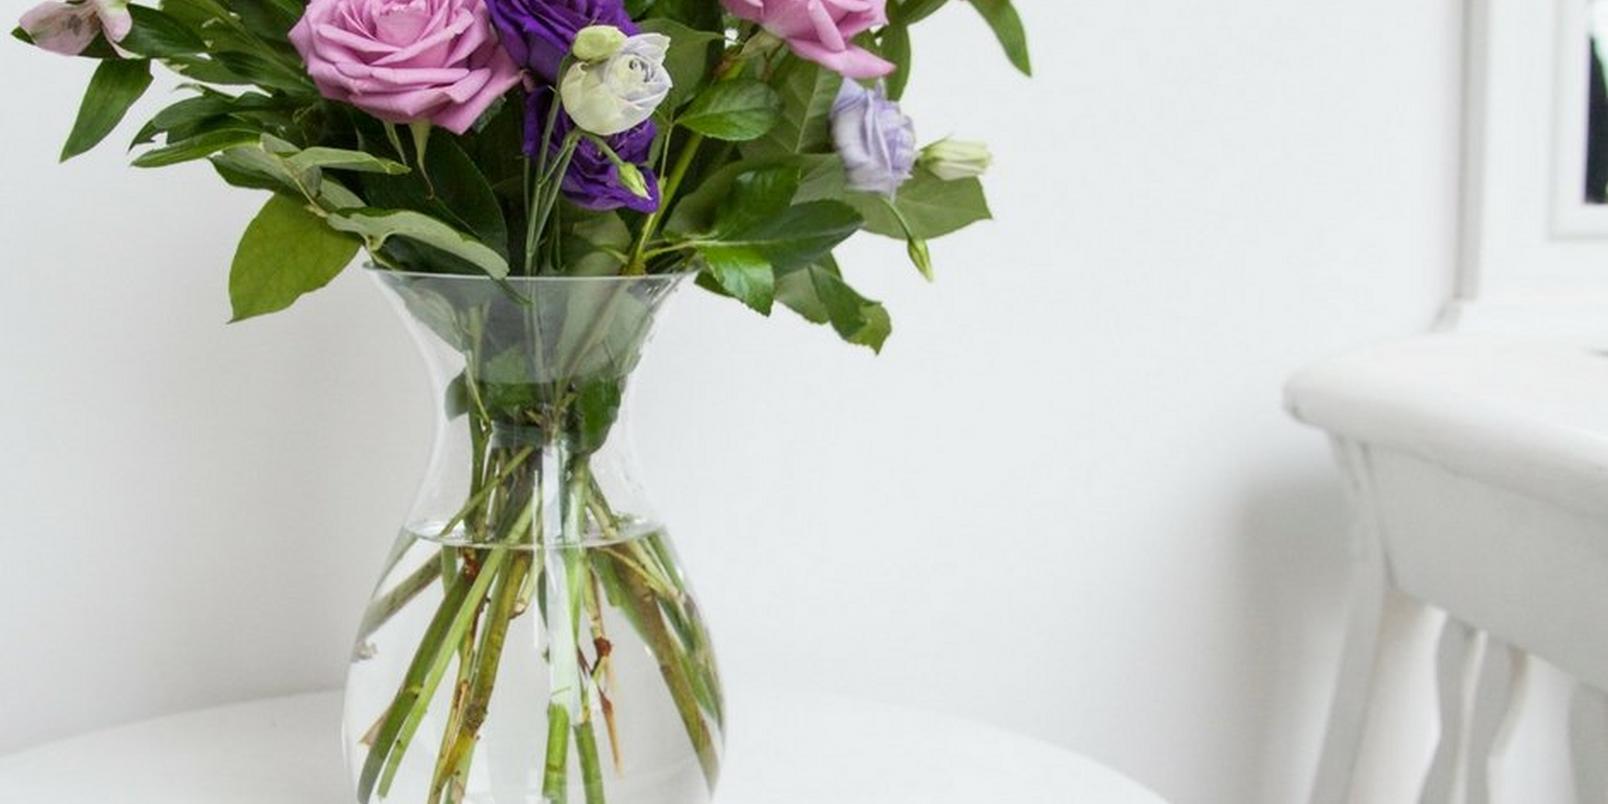 Purple-flowers-in-a-vase